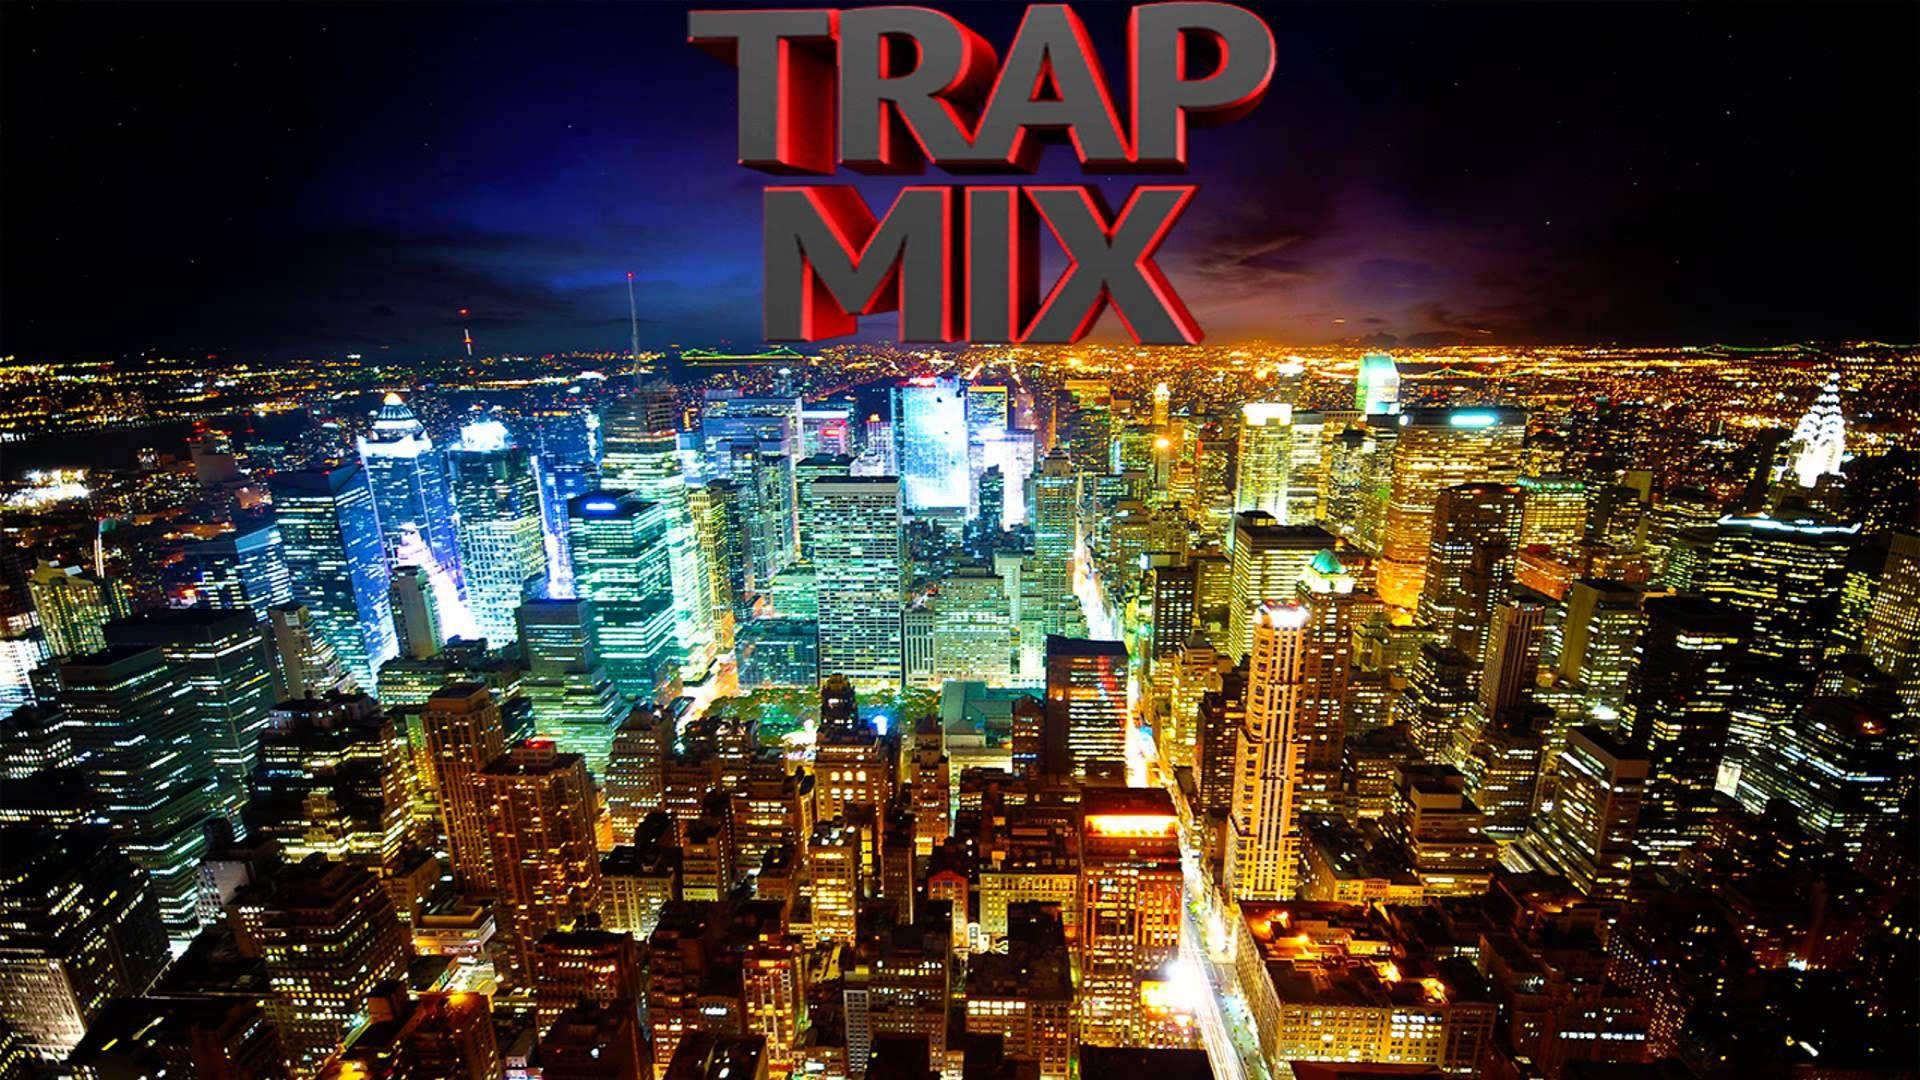 Top 10 Trap Music Remixes